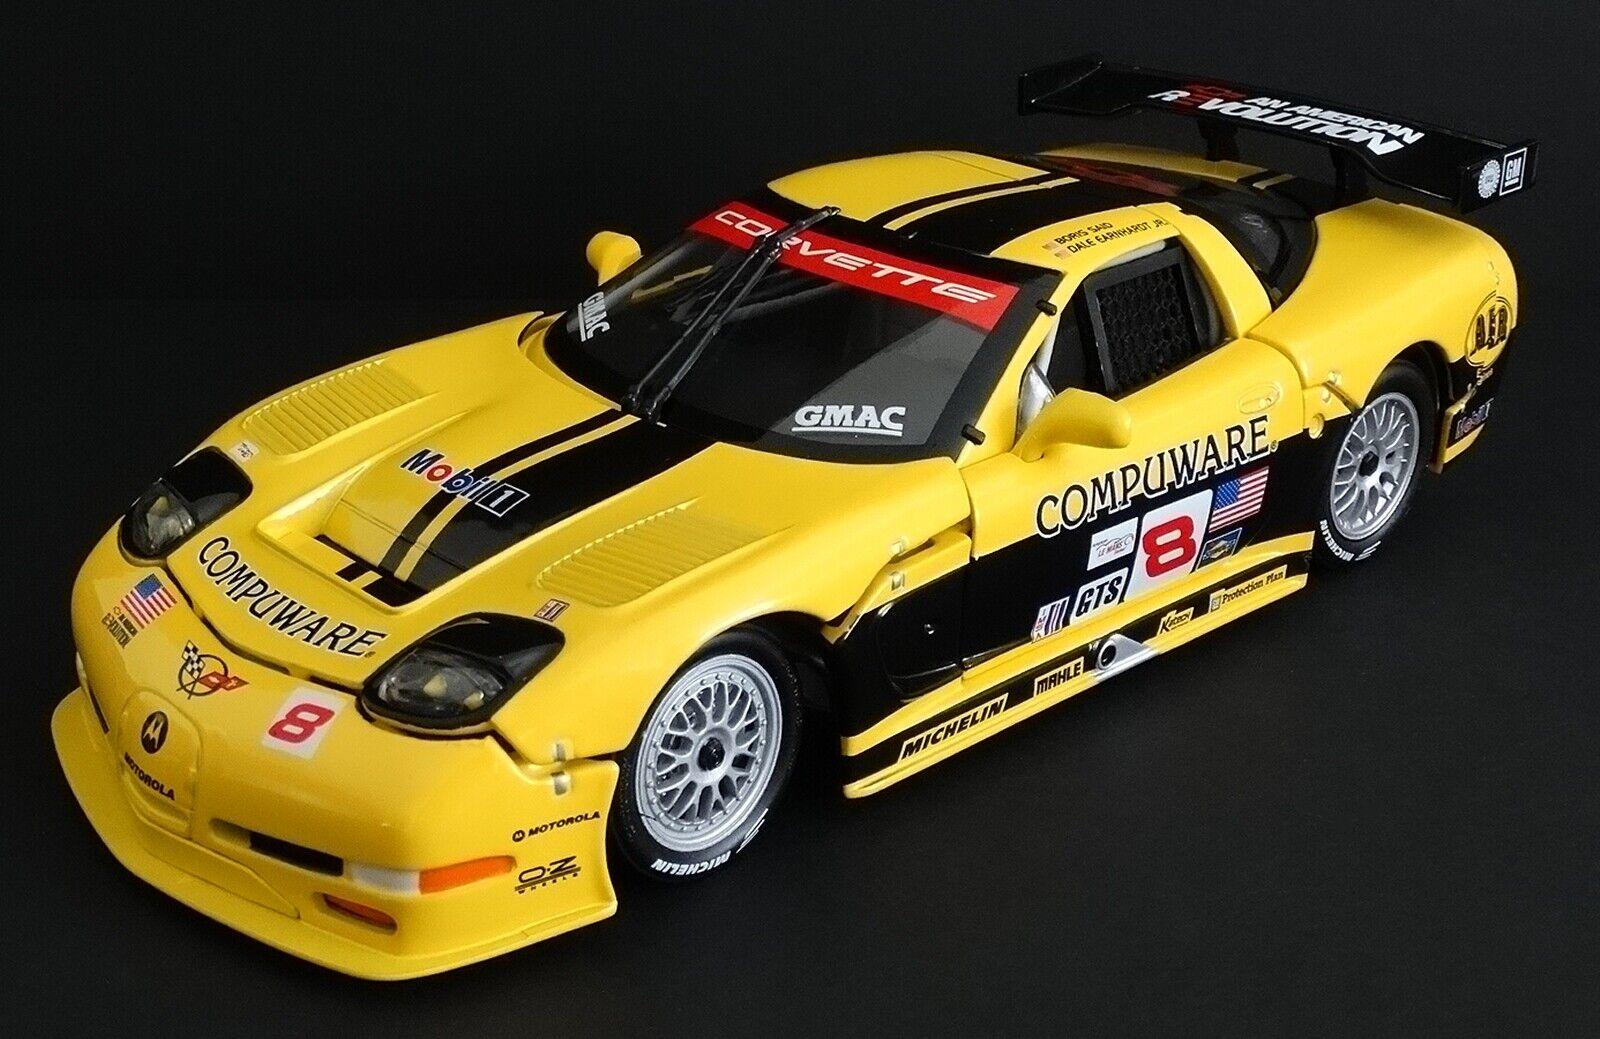 Dale Earnhardt, Jr Boris Said Compuware 1 18 verkan FIERY 2004 Corvette C5R